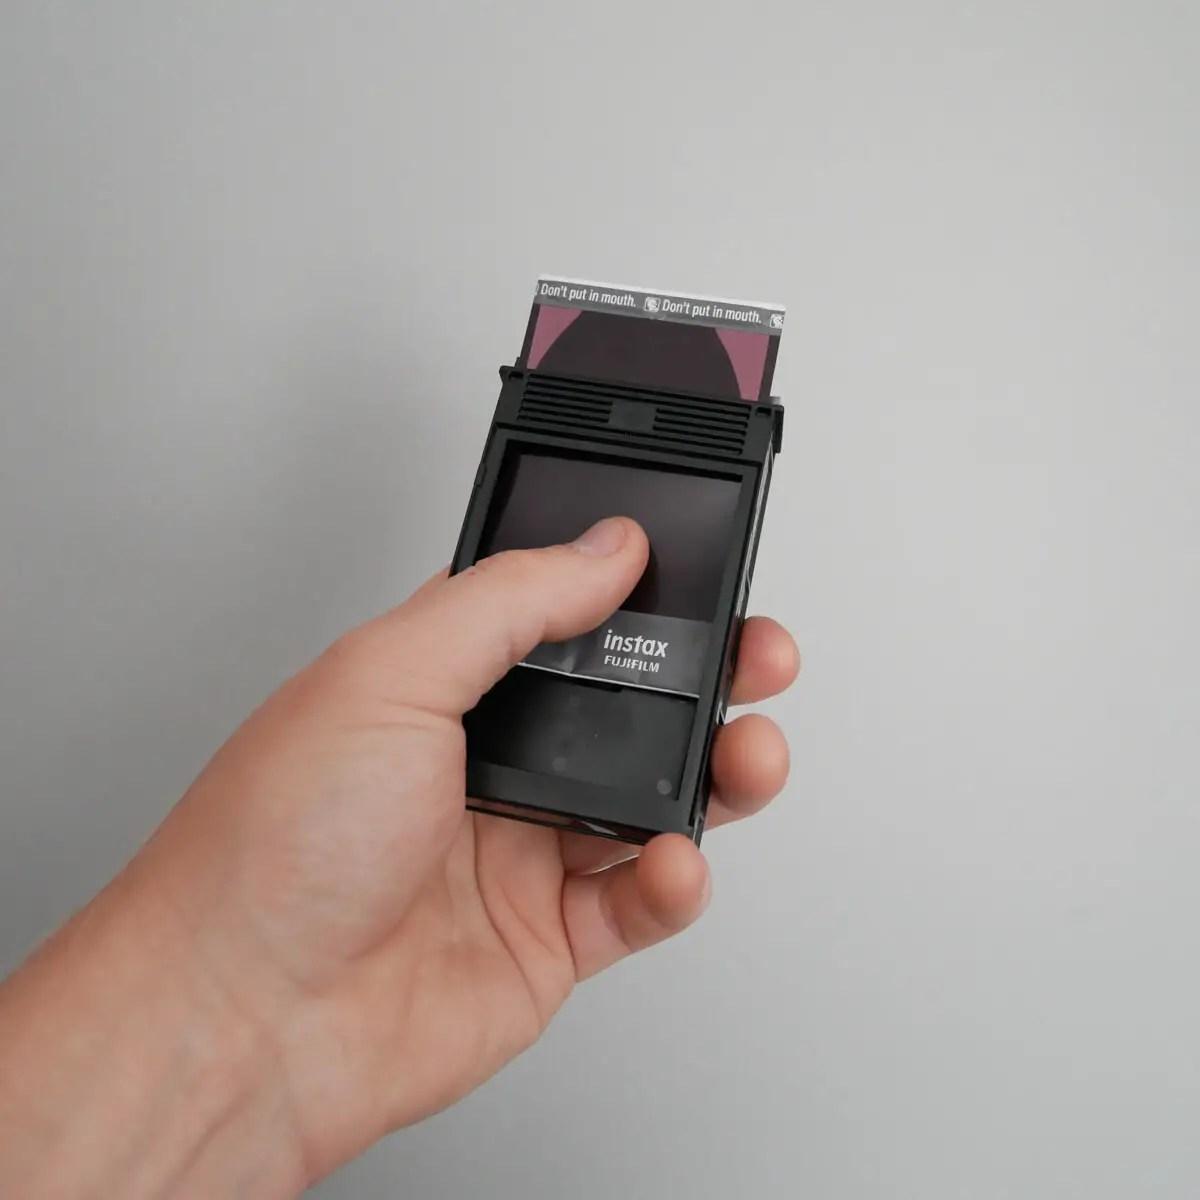 Extraction 3 - Fujifilm Instax Mini in a 35mm camera